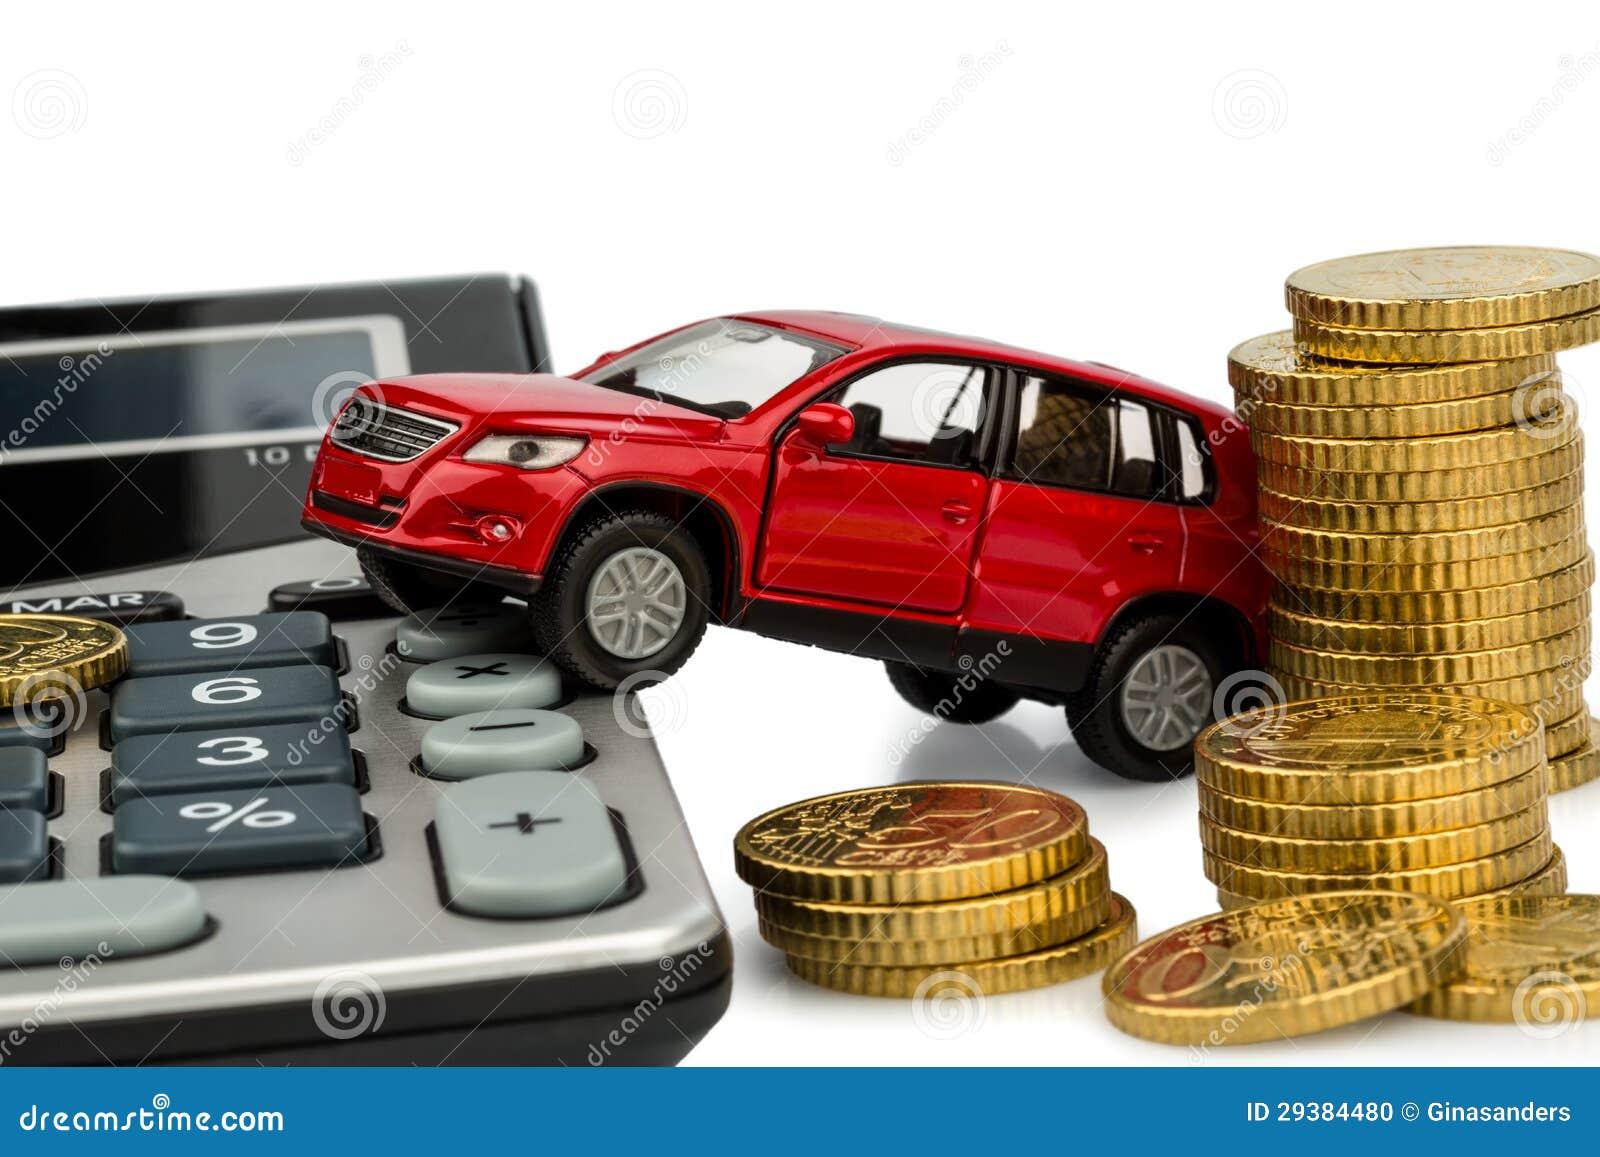 car calculator: